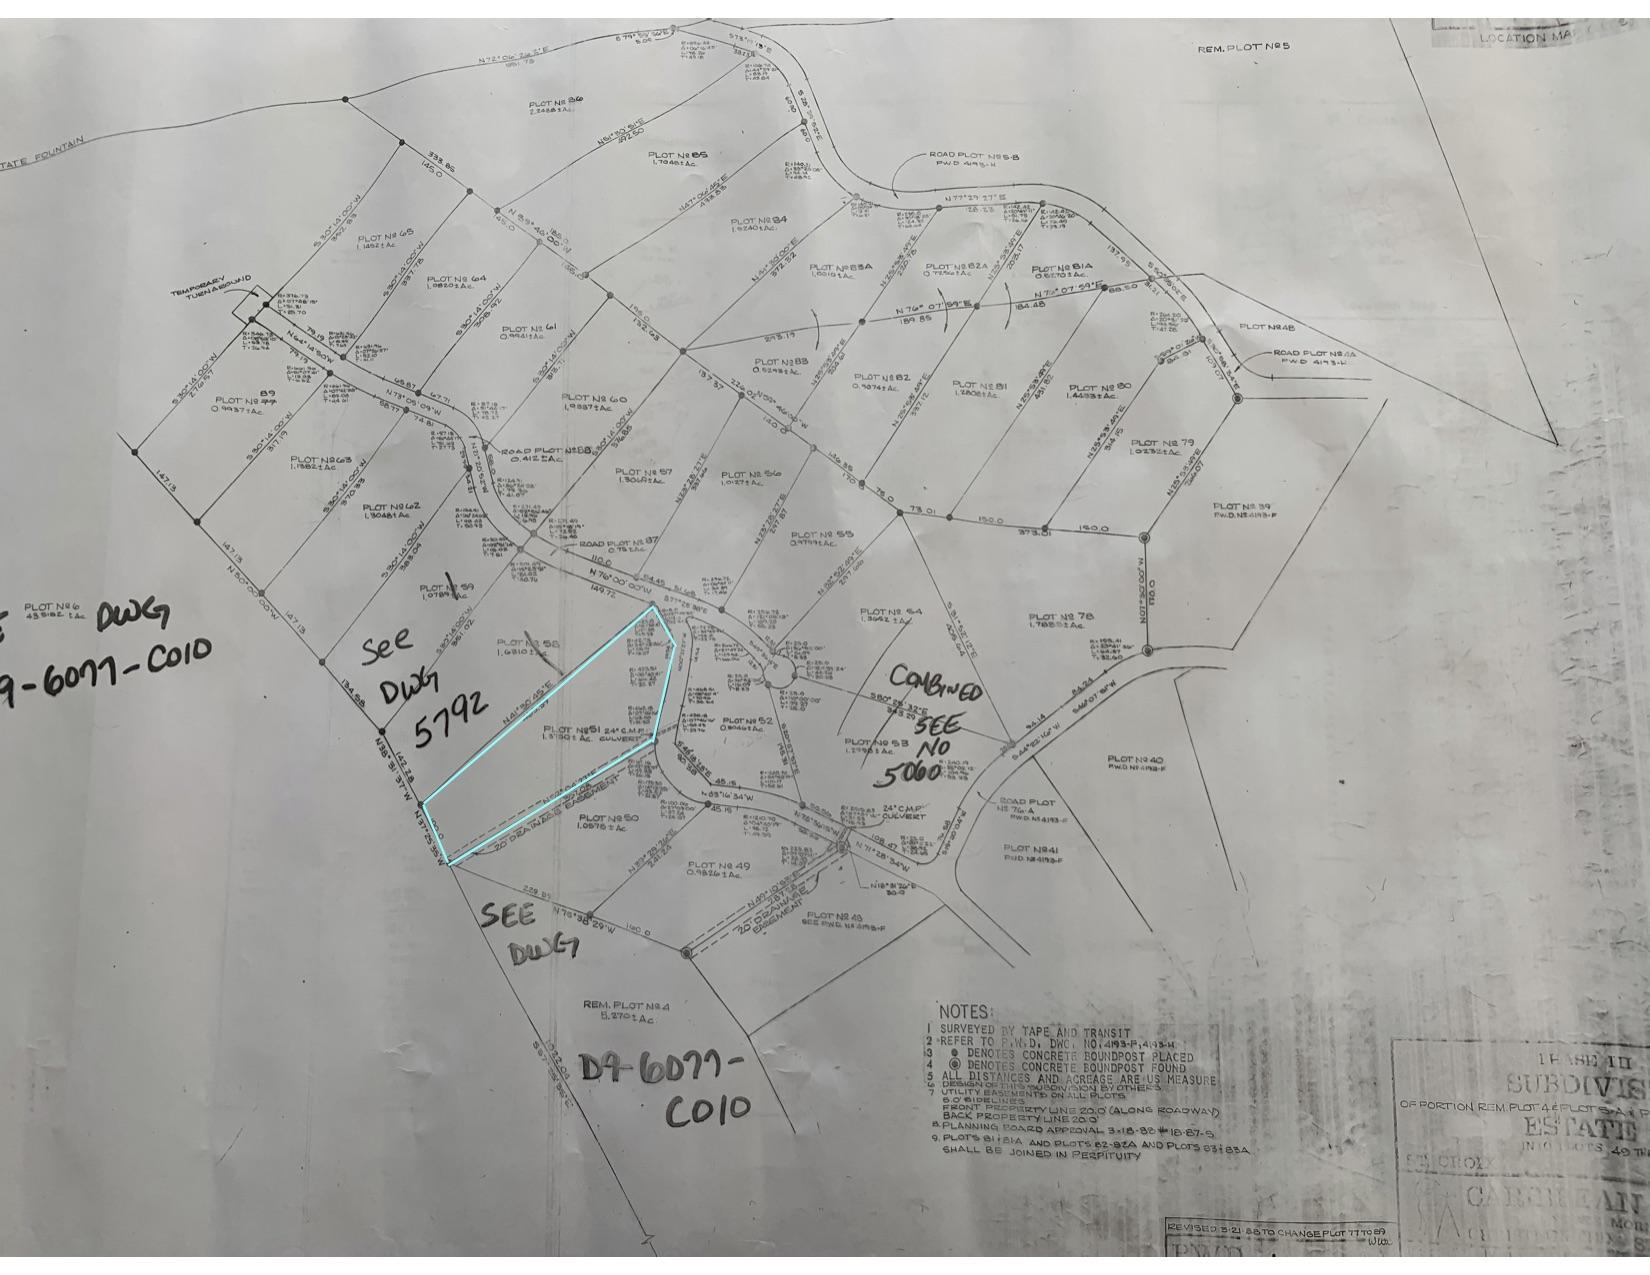 OLG Map 4193-J for 51 River